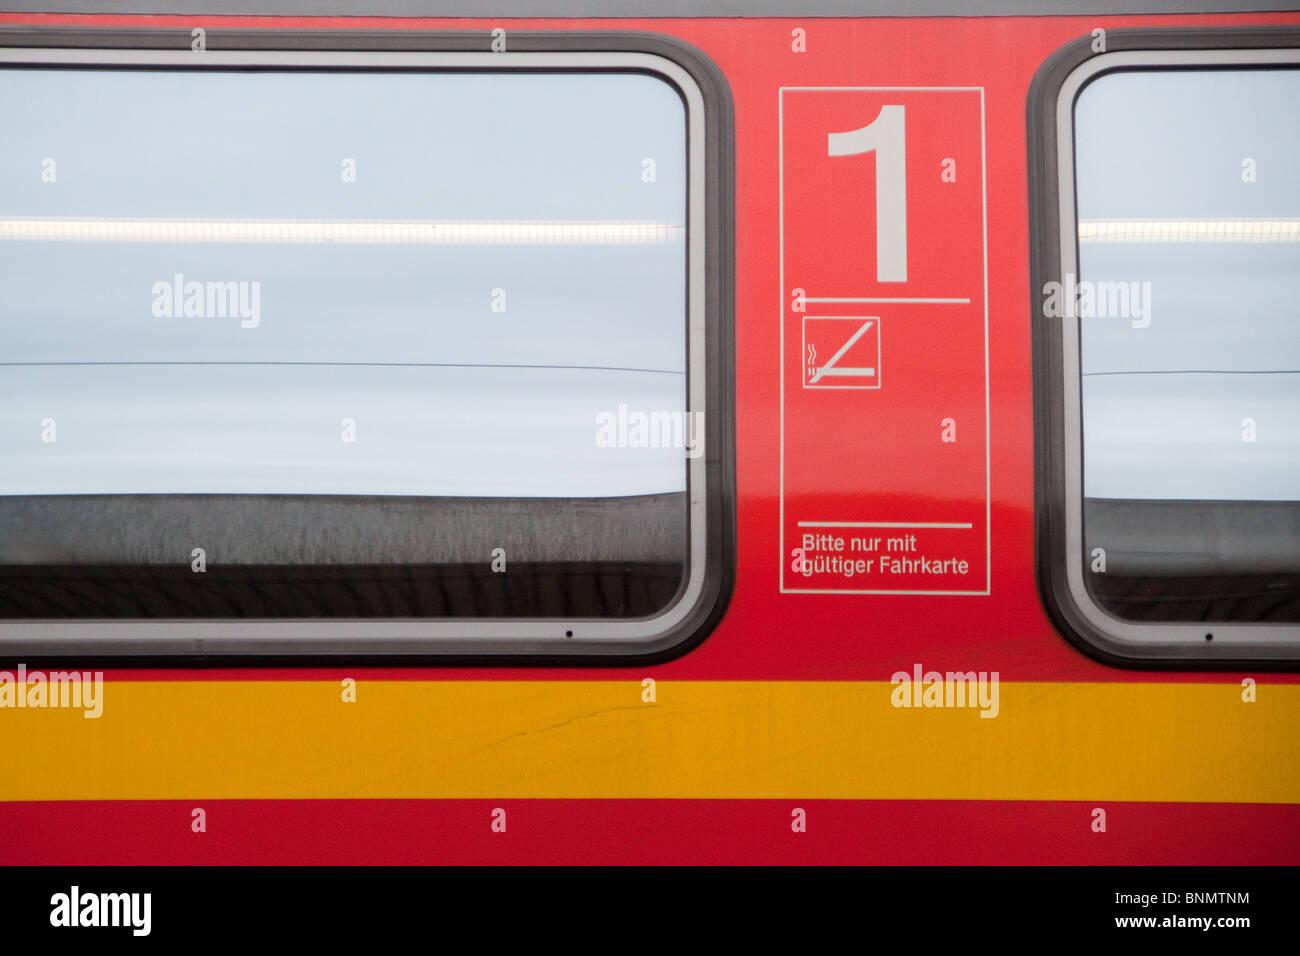 Alemán Deutsche Bahn carro de ferrocarril en primera clase Imagen De Stock